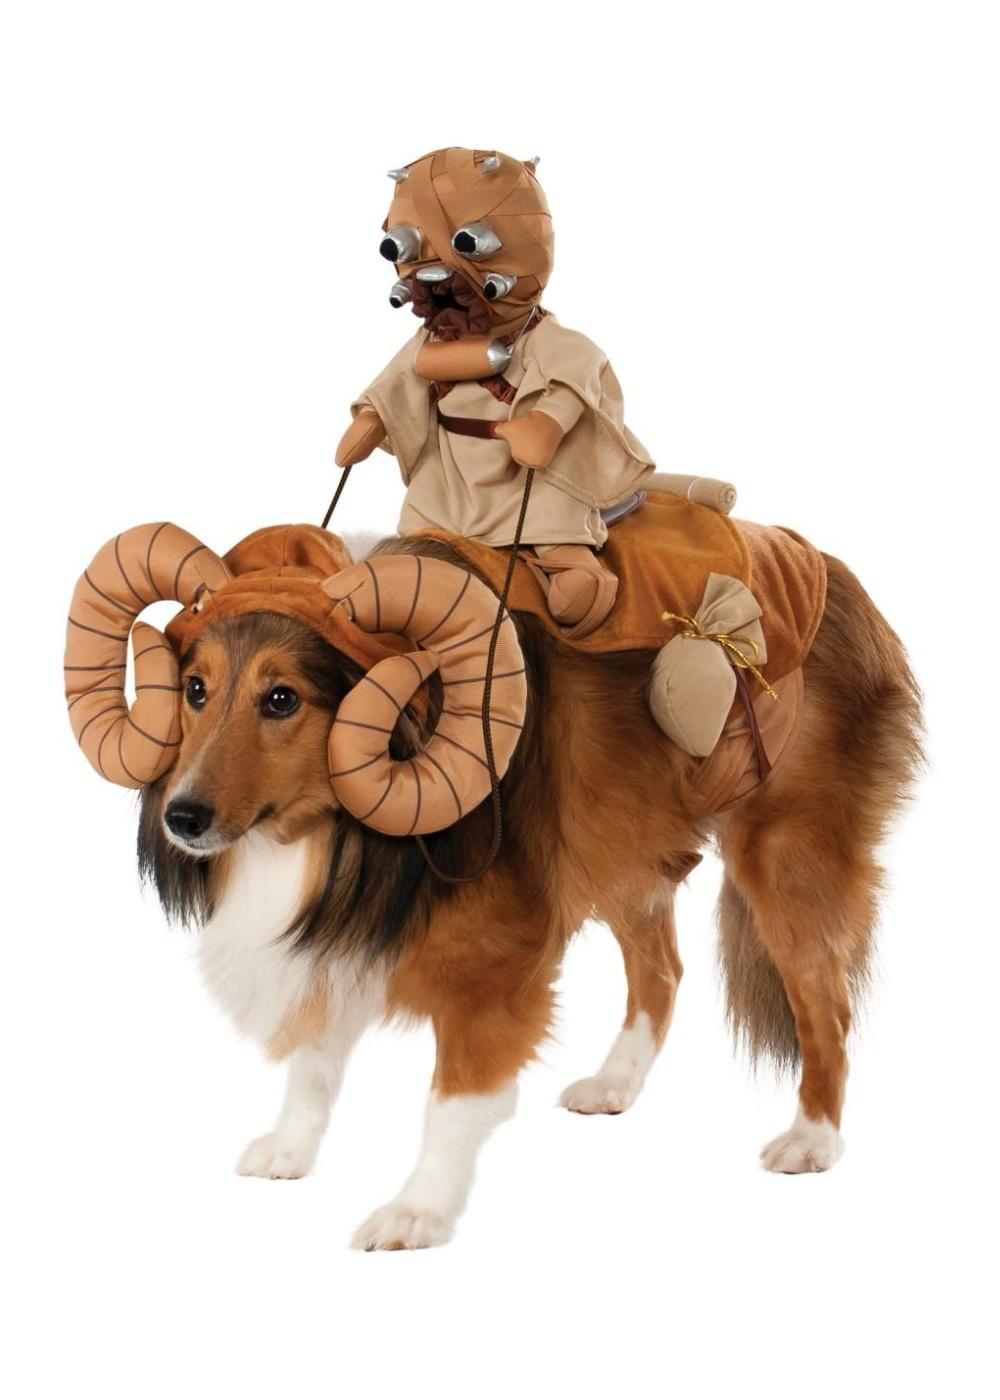 Stars Wars Dog Bantha Rider Costume